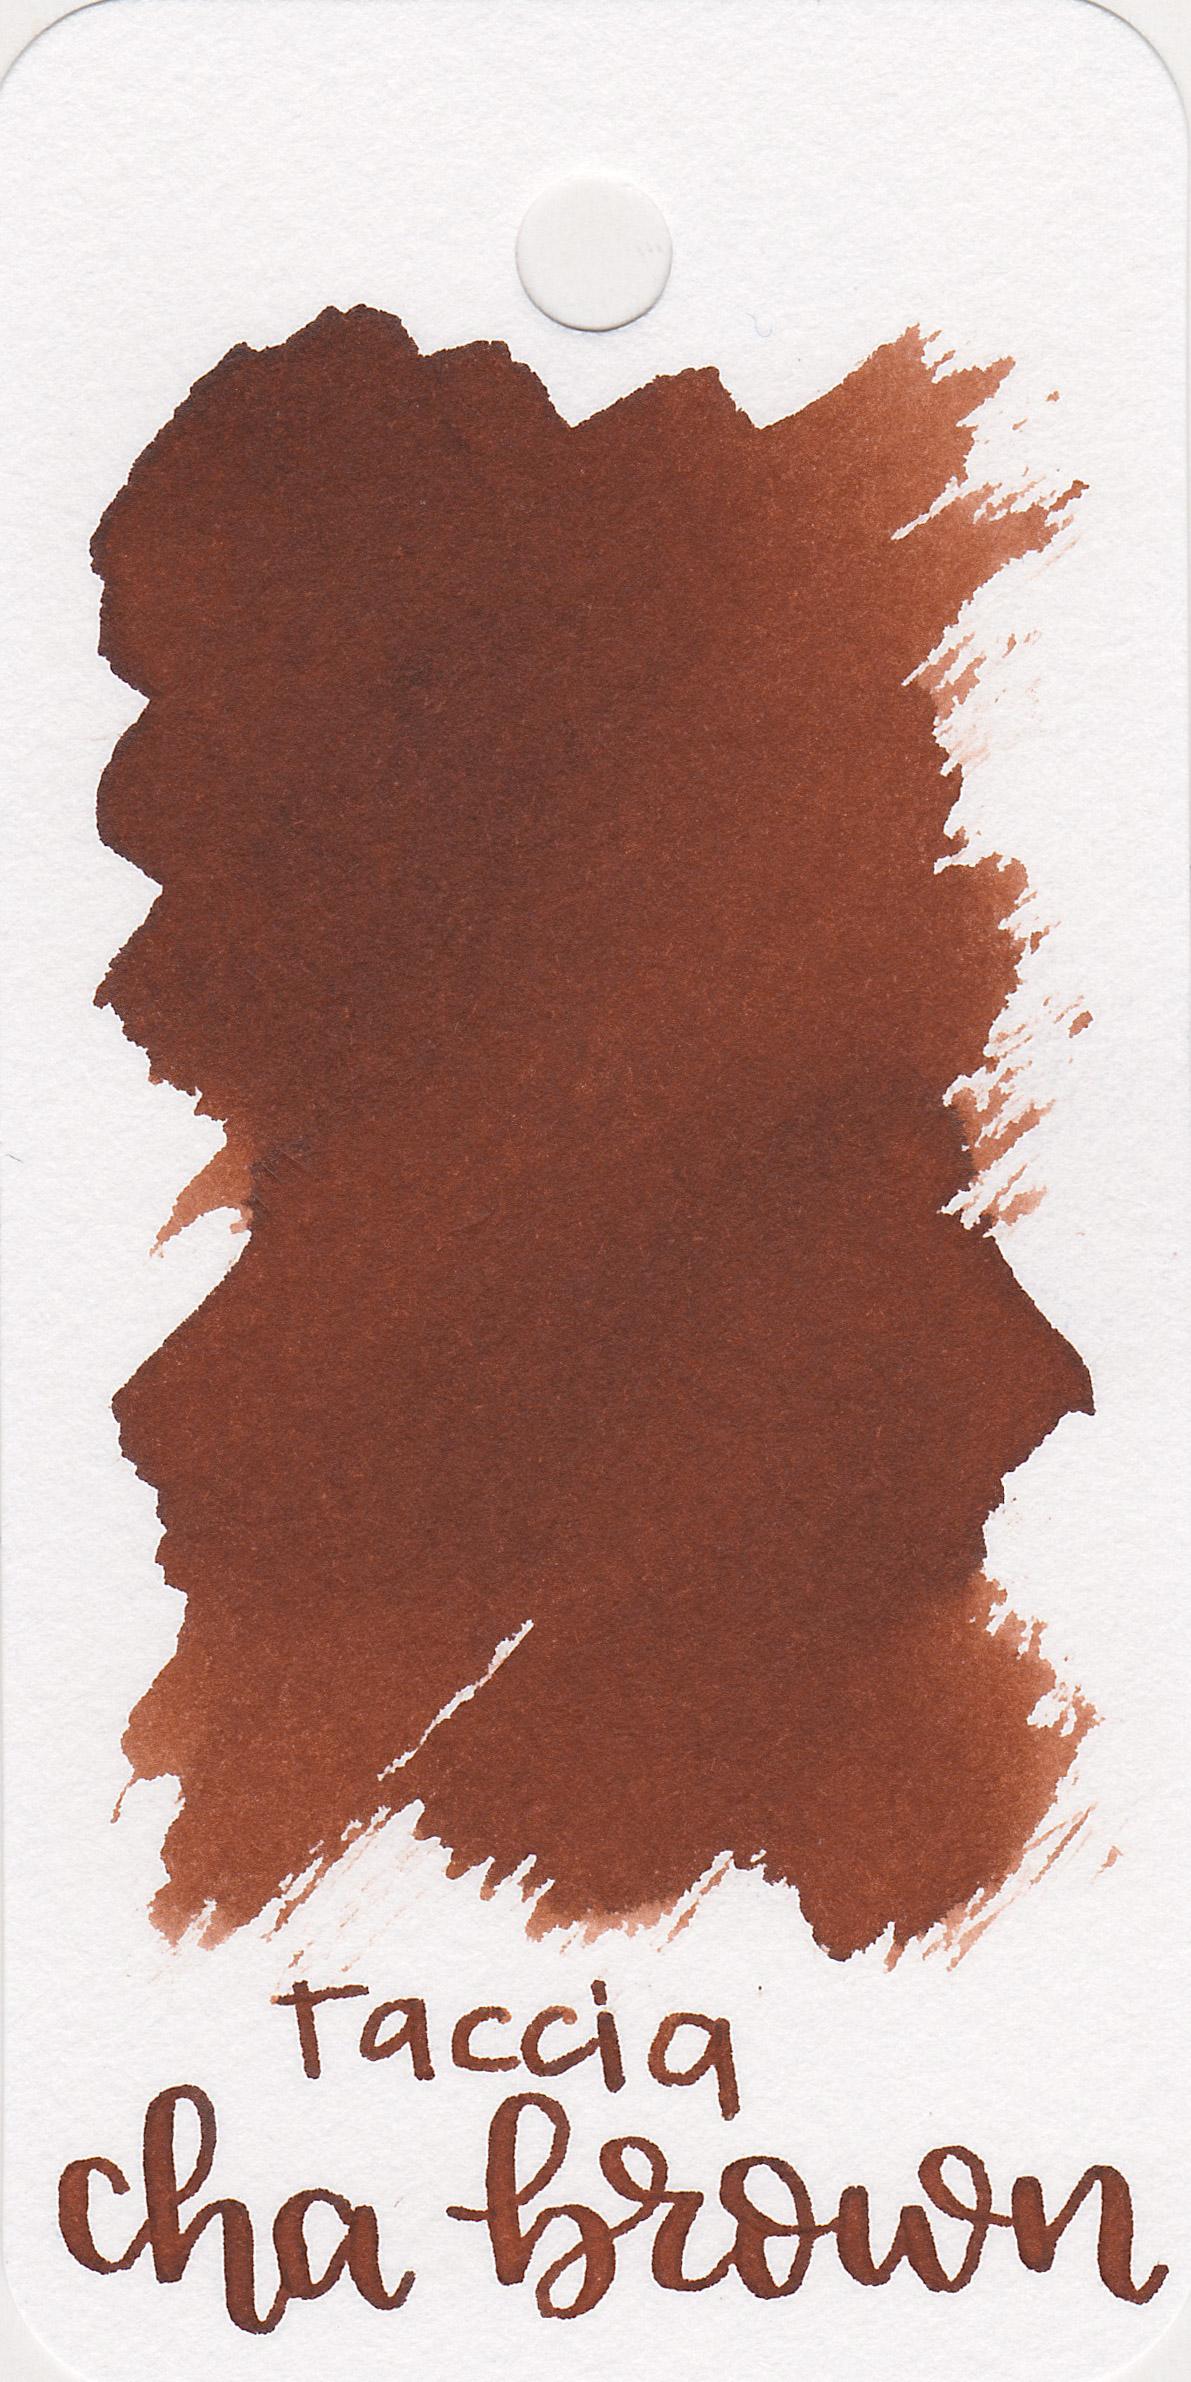 tac-cha-brown-1.jpg